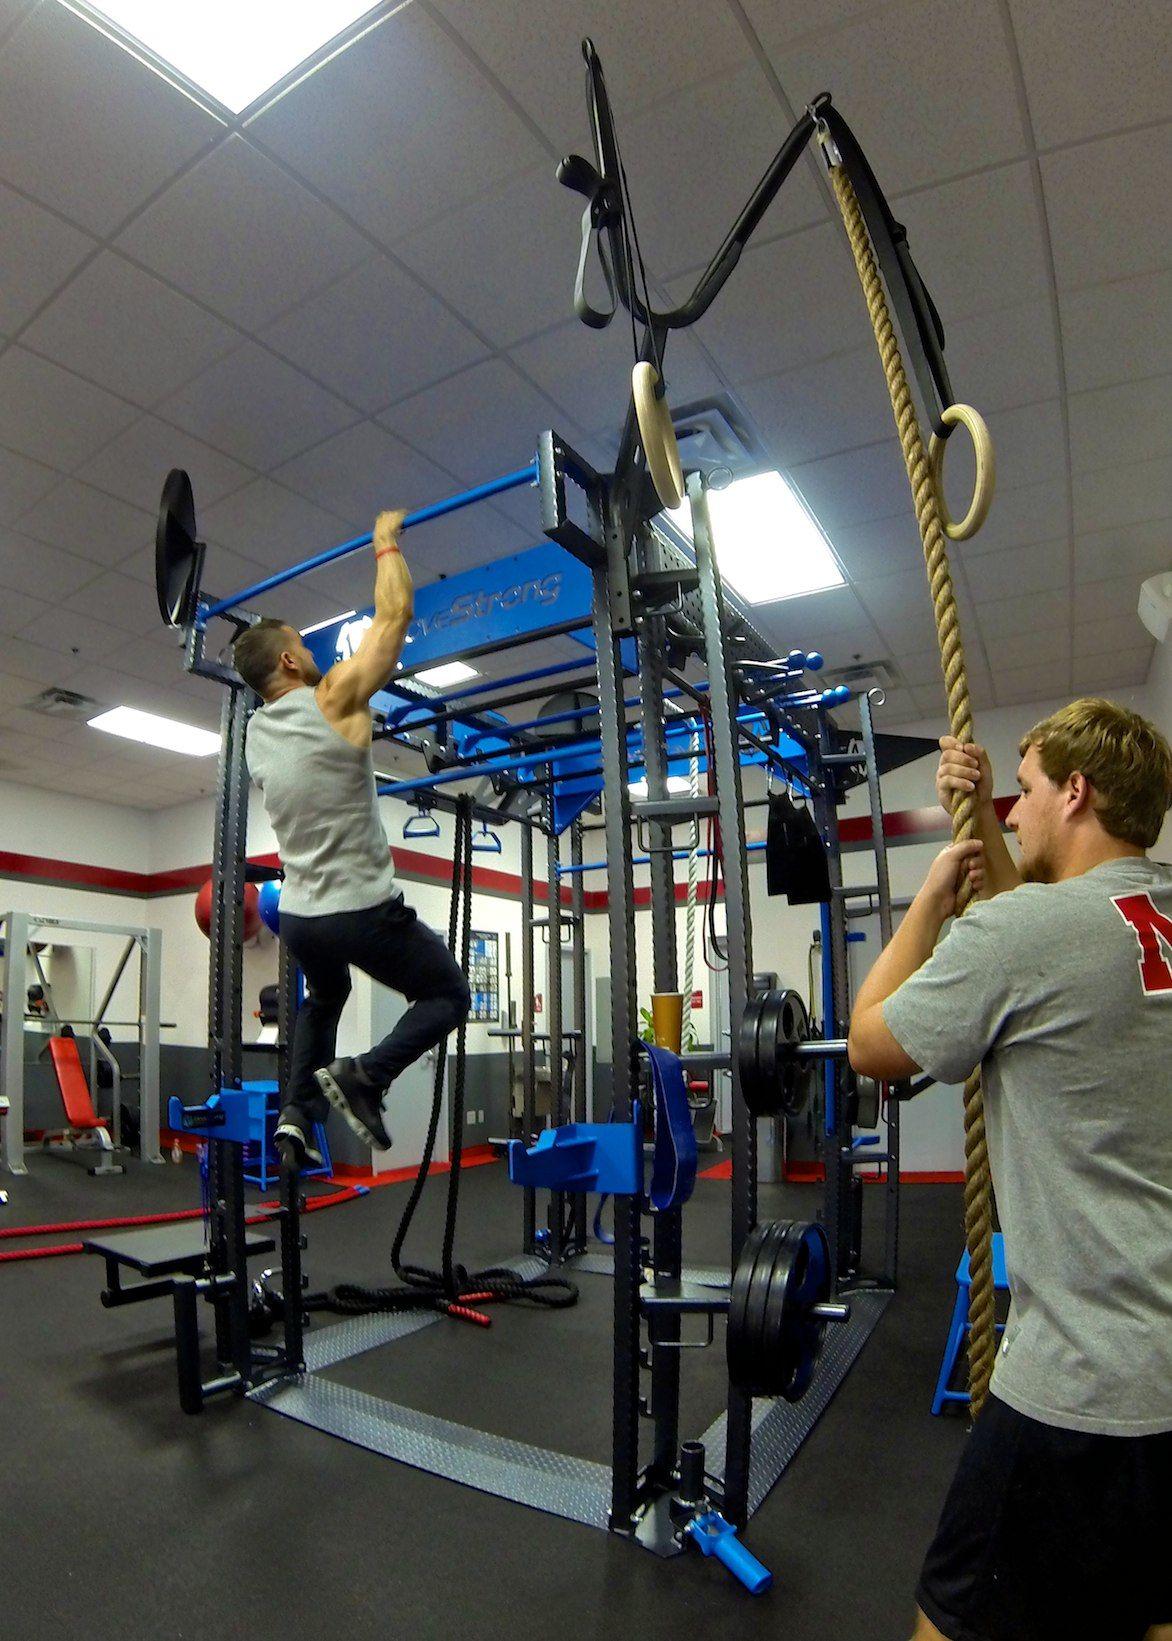 Snap Fitness-Functional training equipment